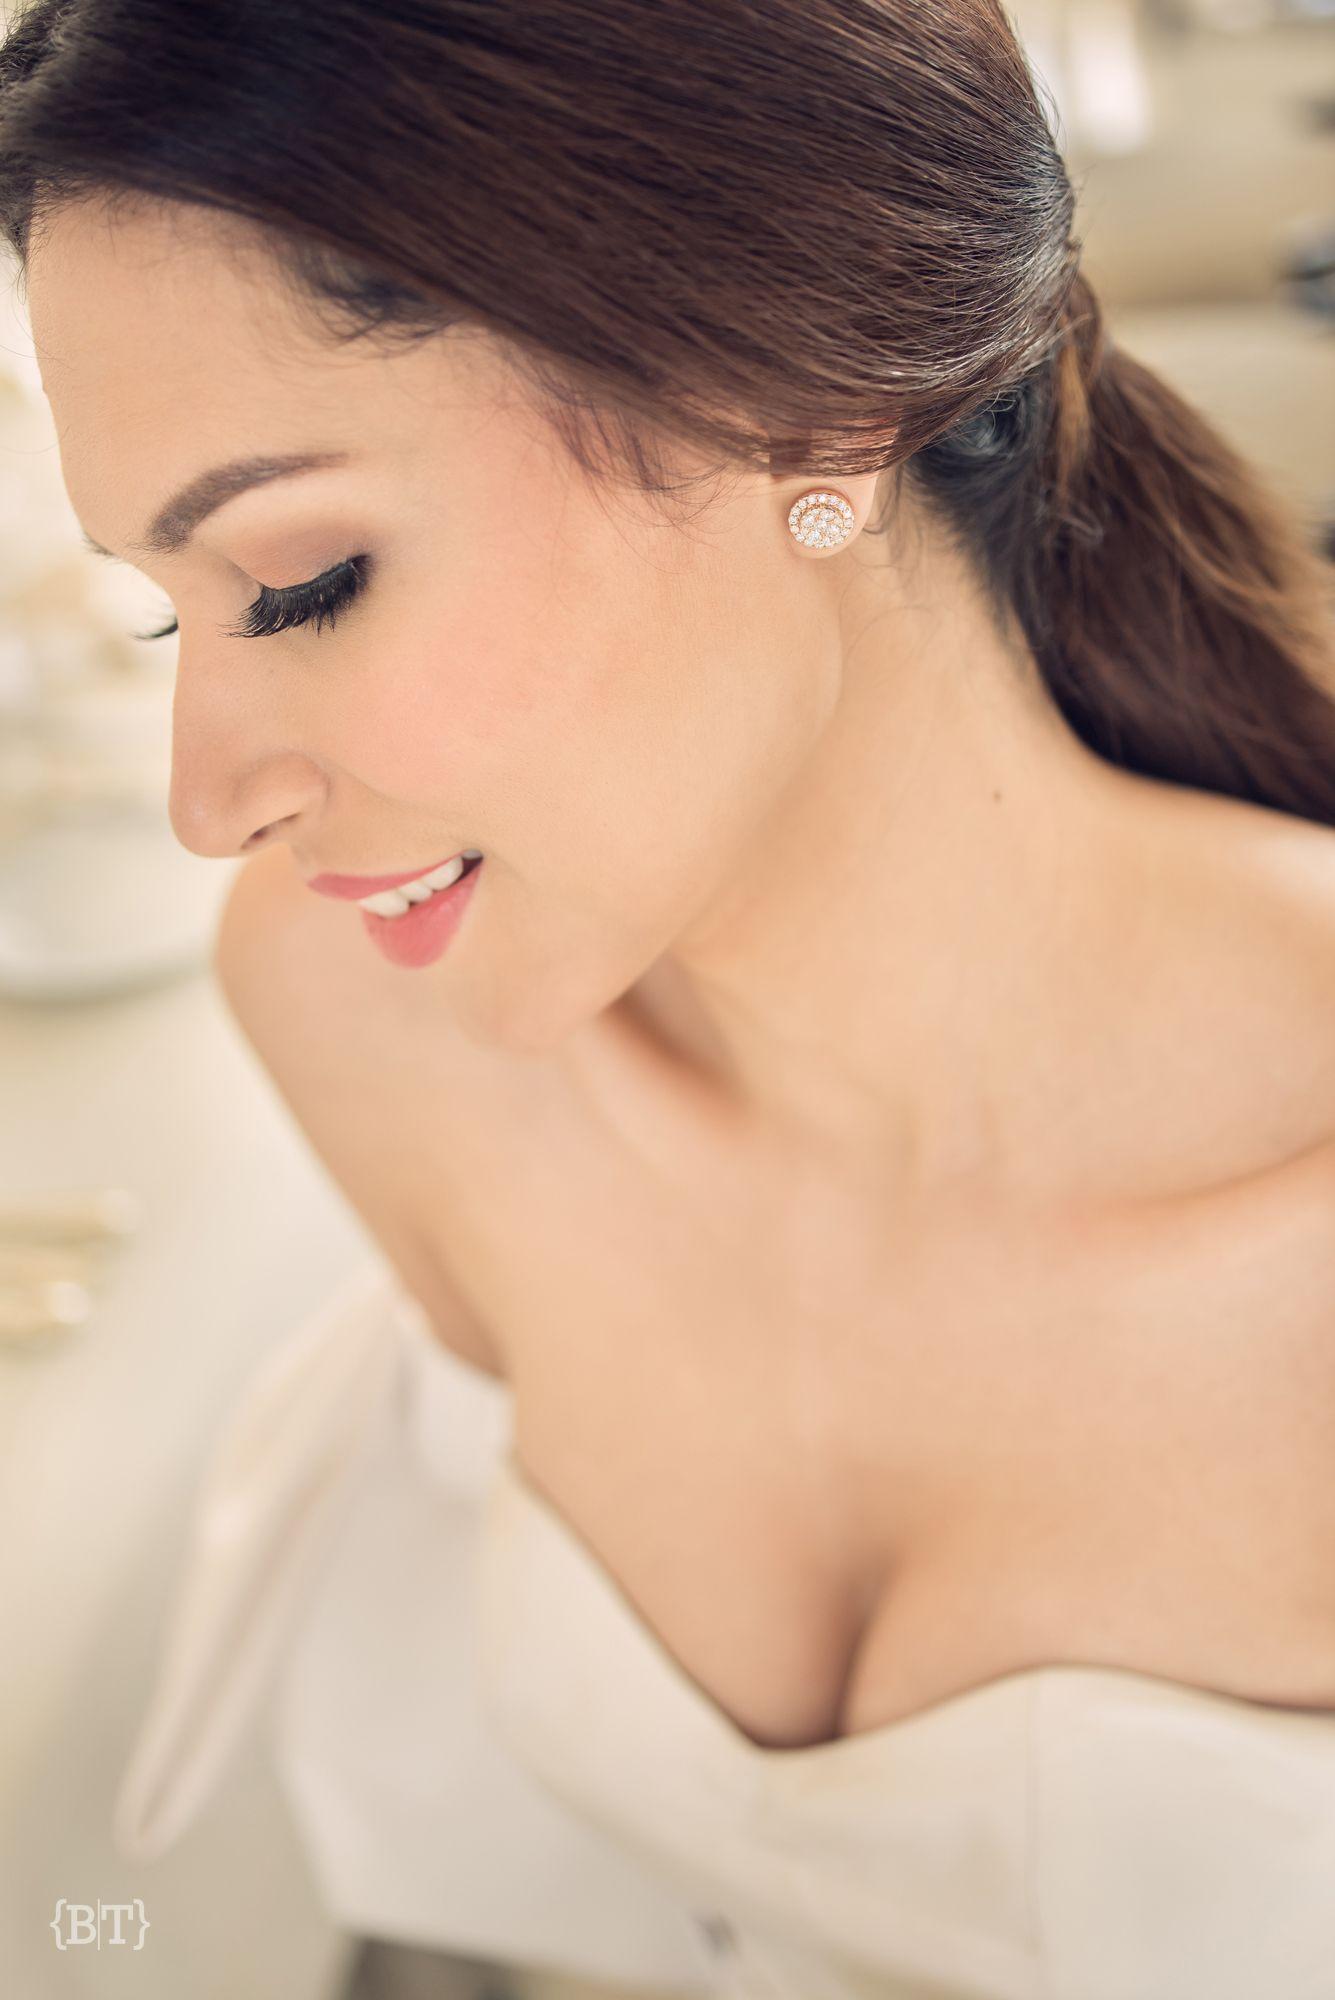 Bea Almeda Benjie Tiongco Photography Bridal Hair And Makeup Weddingdetails Weddinghairstyles W Bridal Hair And Makeup Classy Wedding Wedding Trends